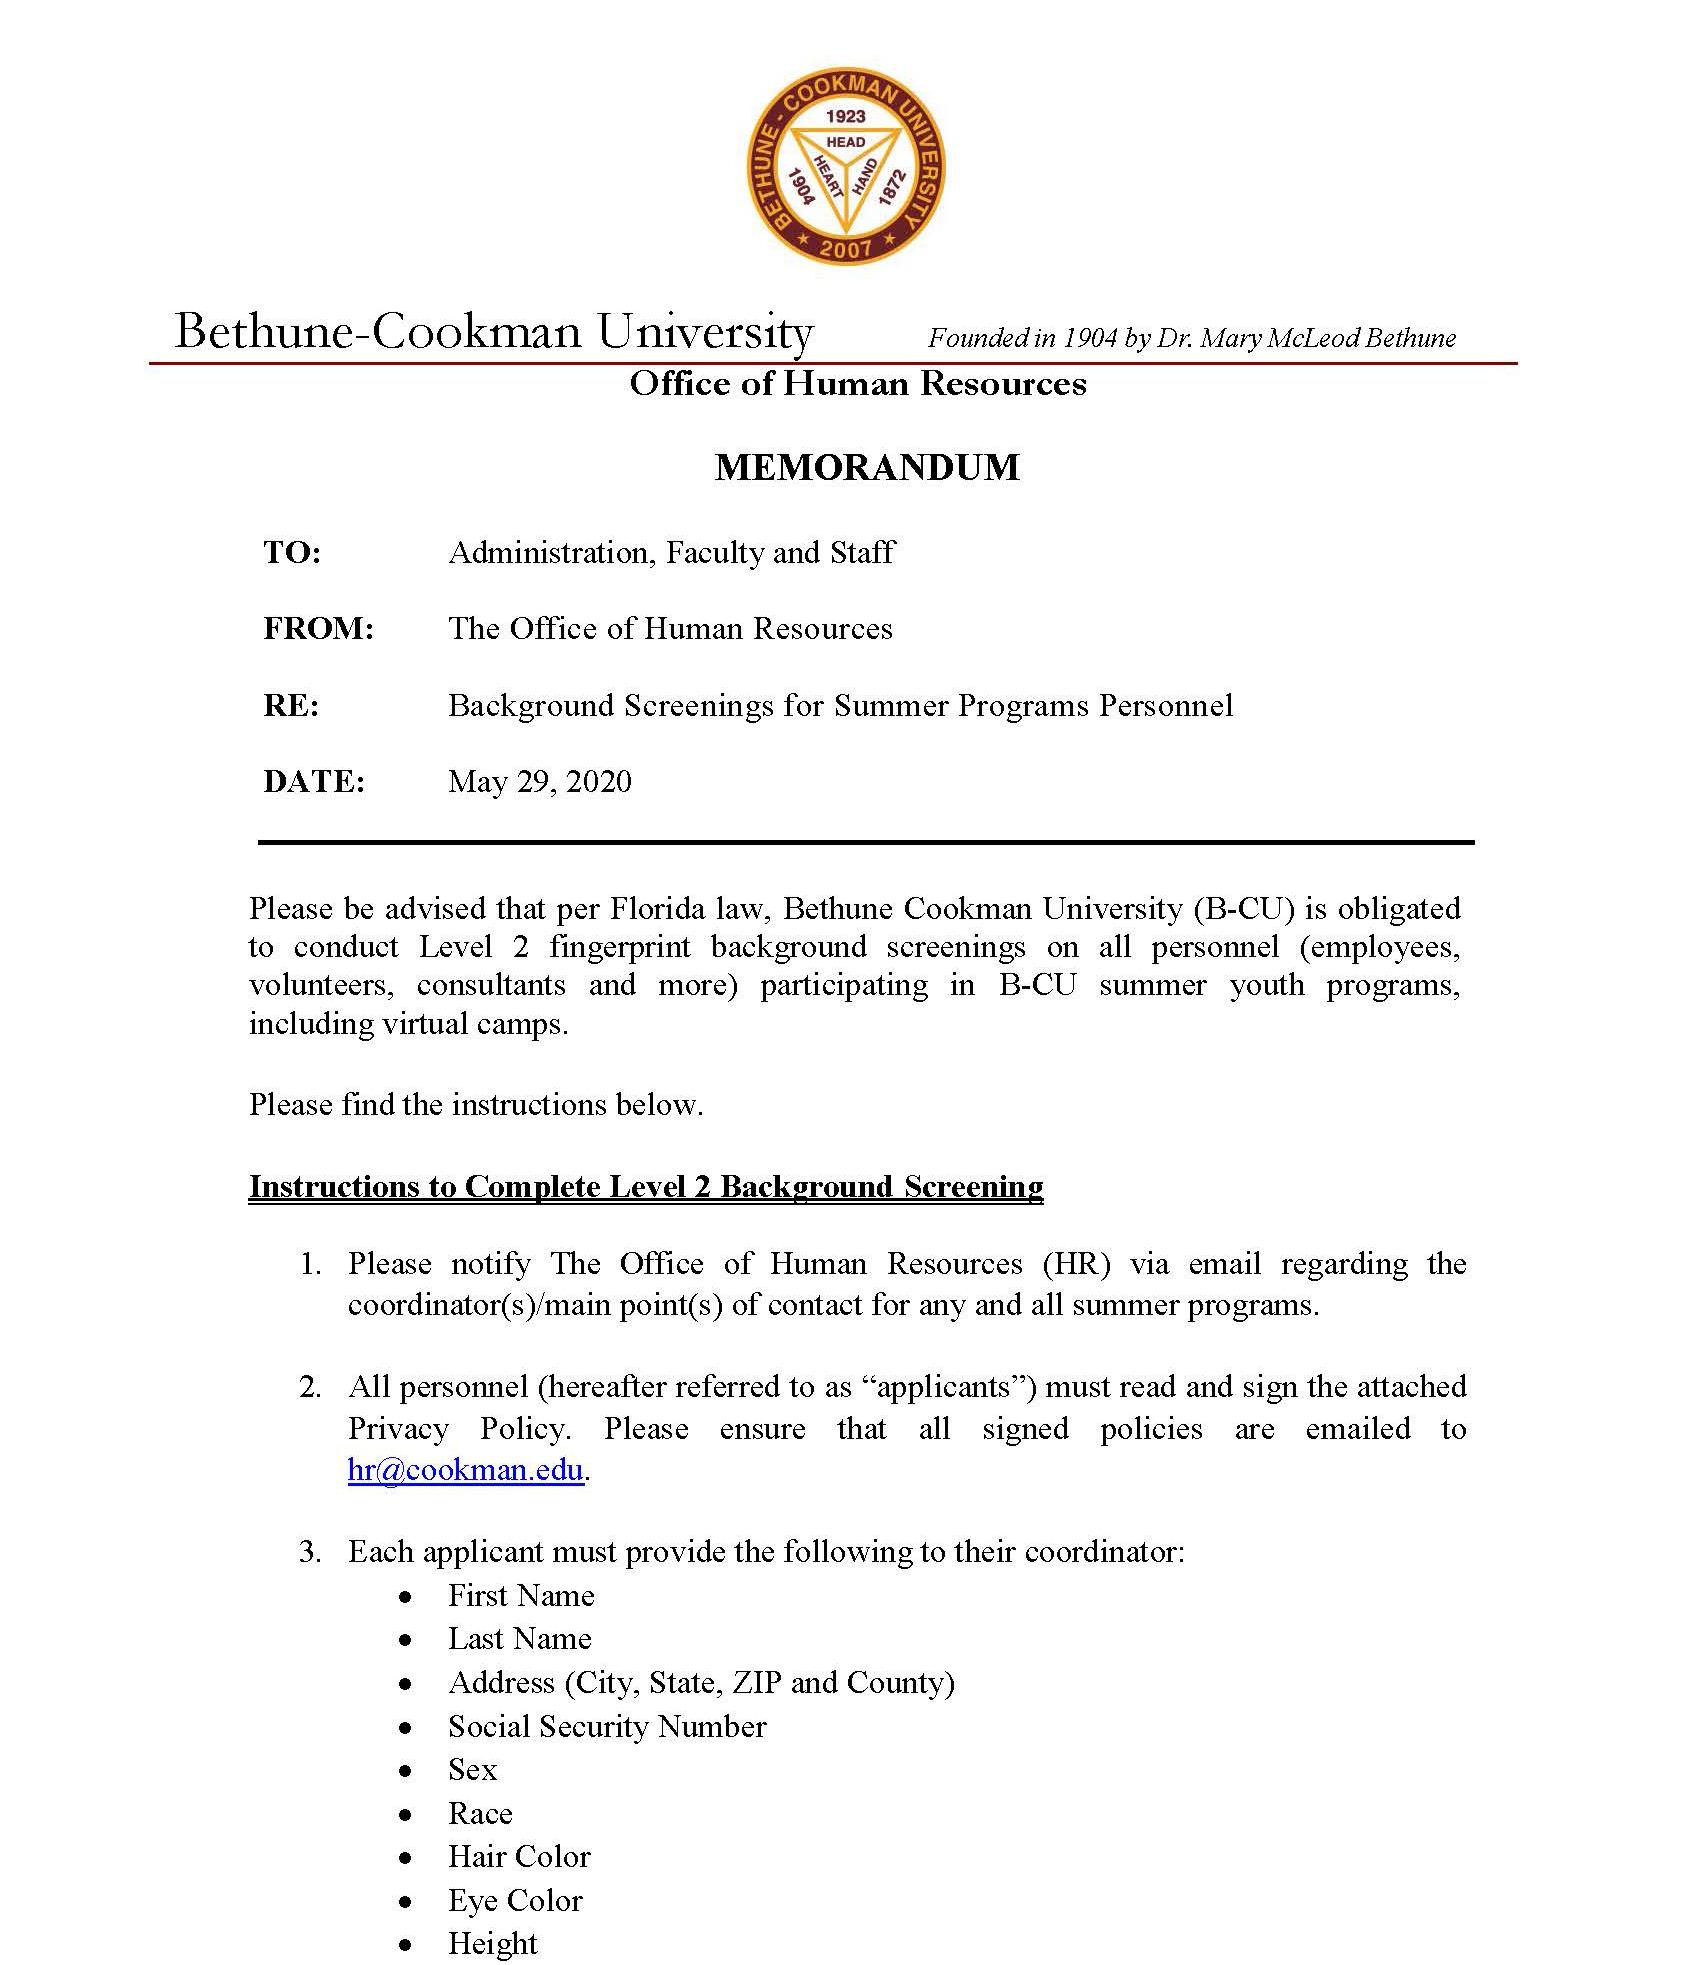 COVID-19 Updates | Bethune-Cookman University